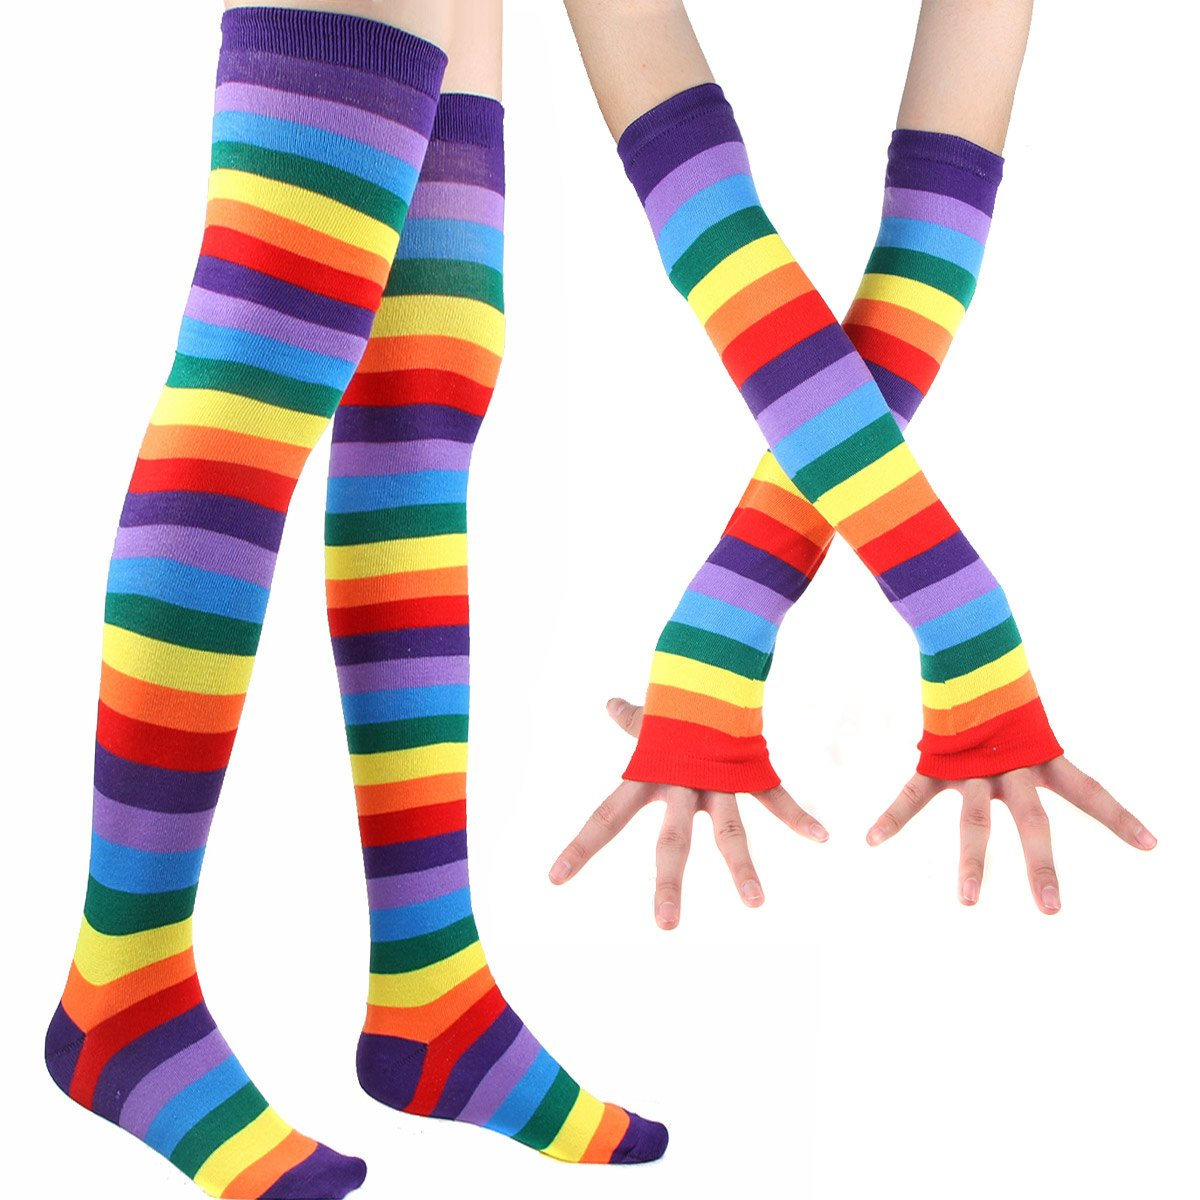 Colorful Rainbow Stripe Leggings Long Knit Gloves Socks Set Party Costume Accessory IETANG